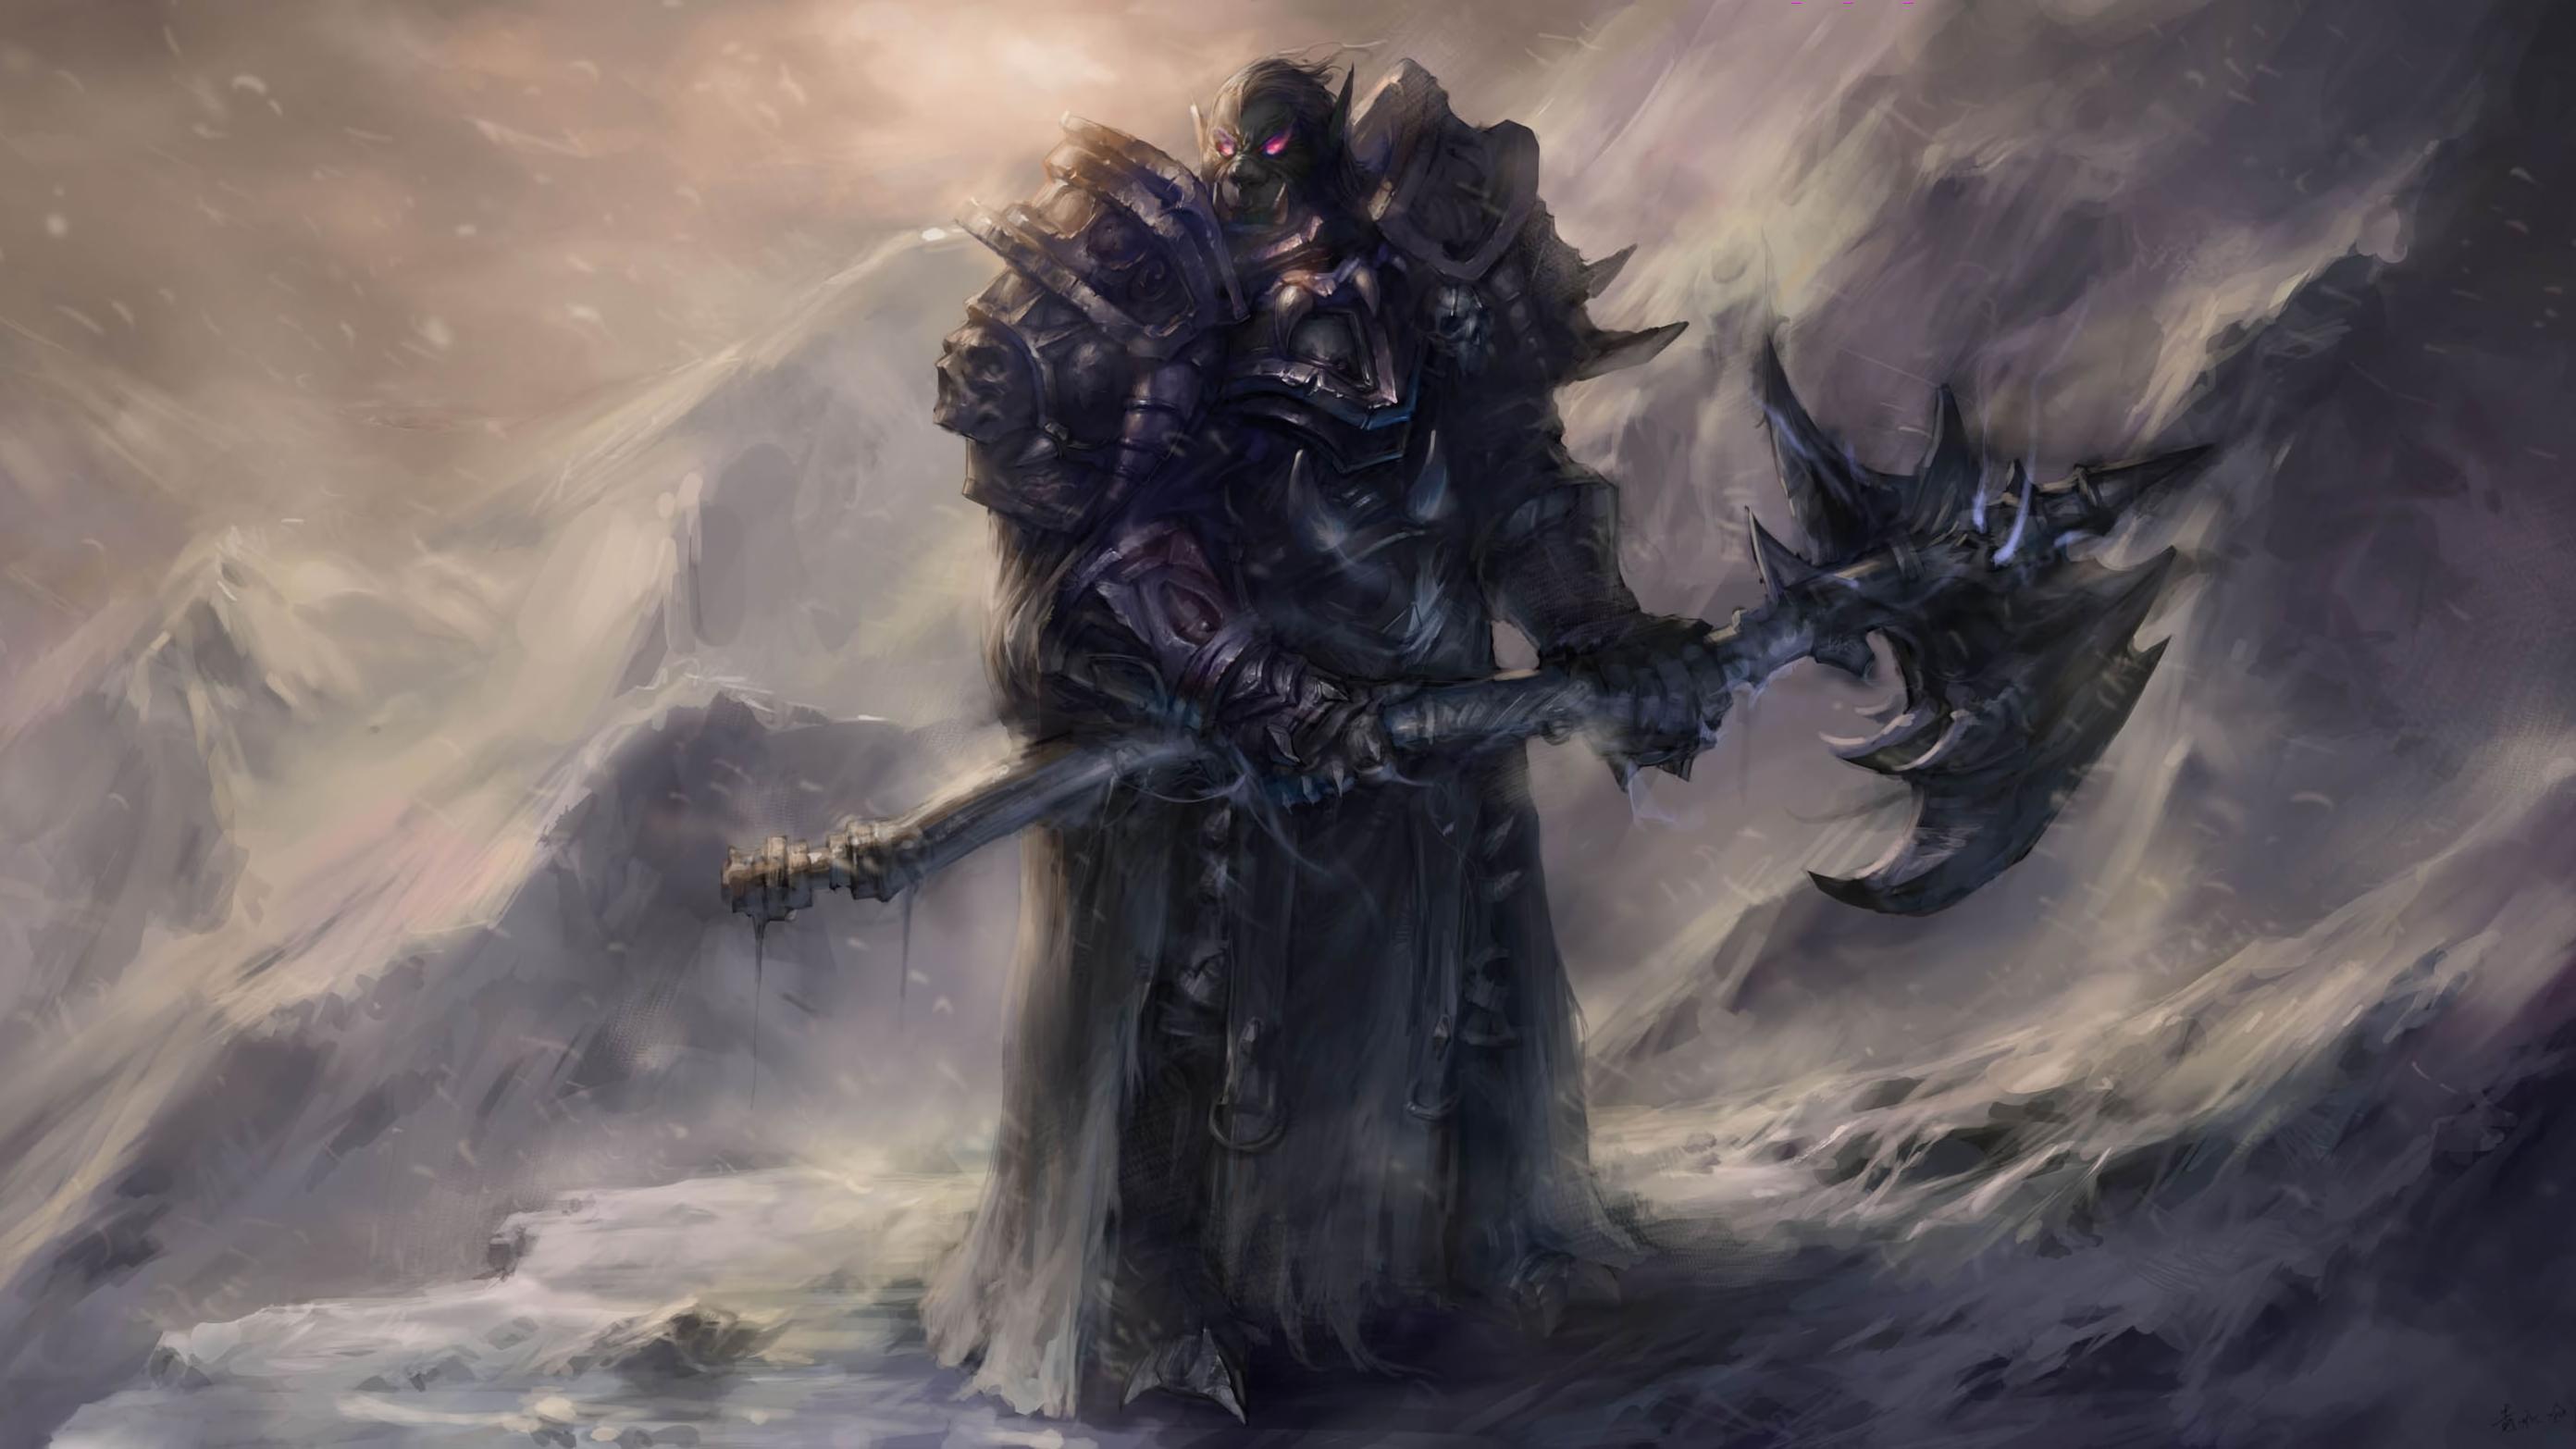 World of warcraft orc speak nude photos